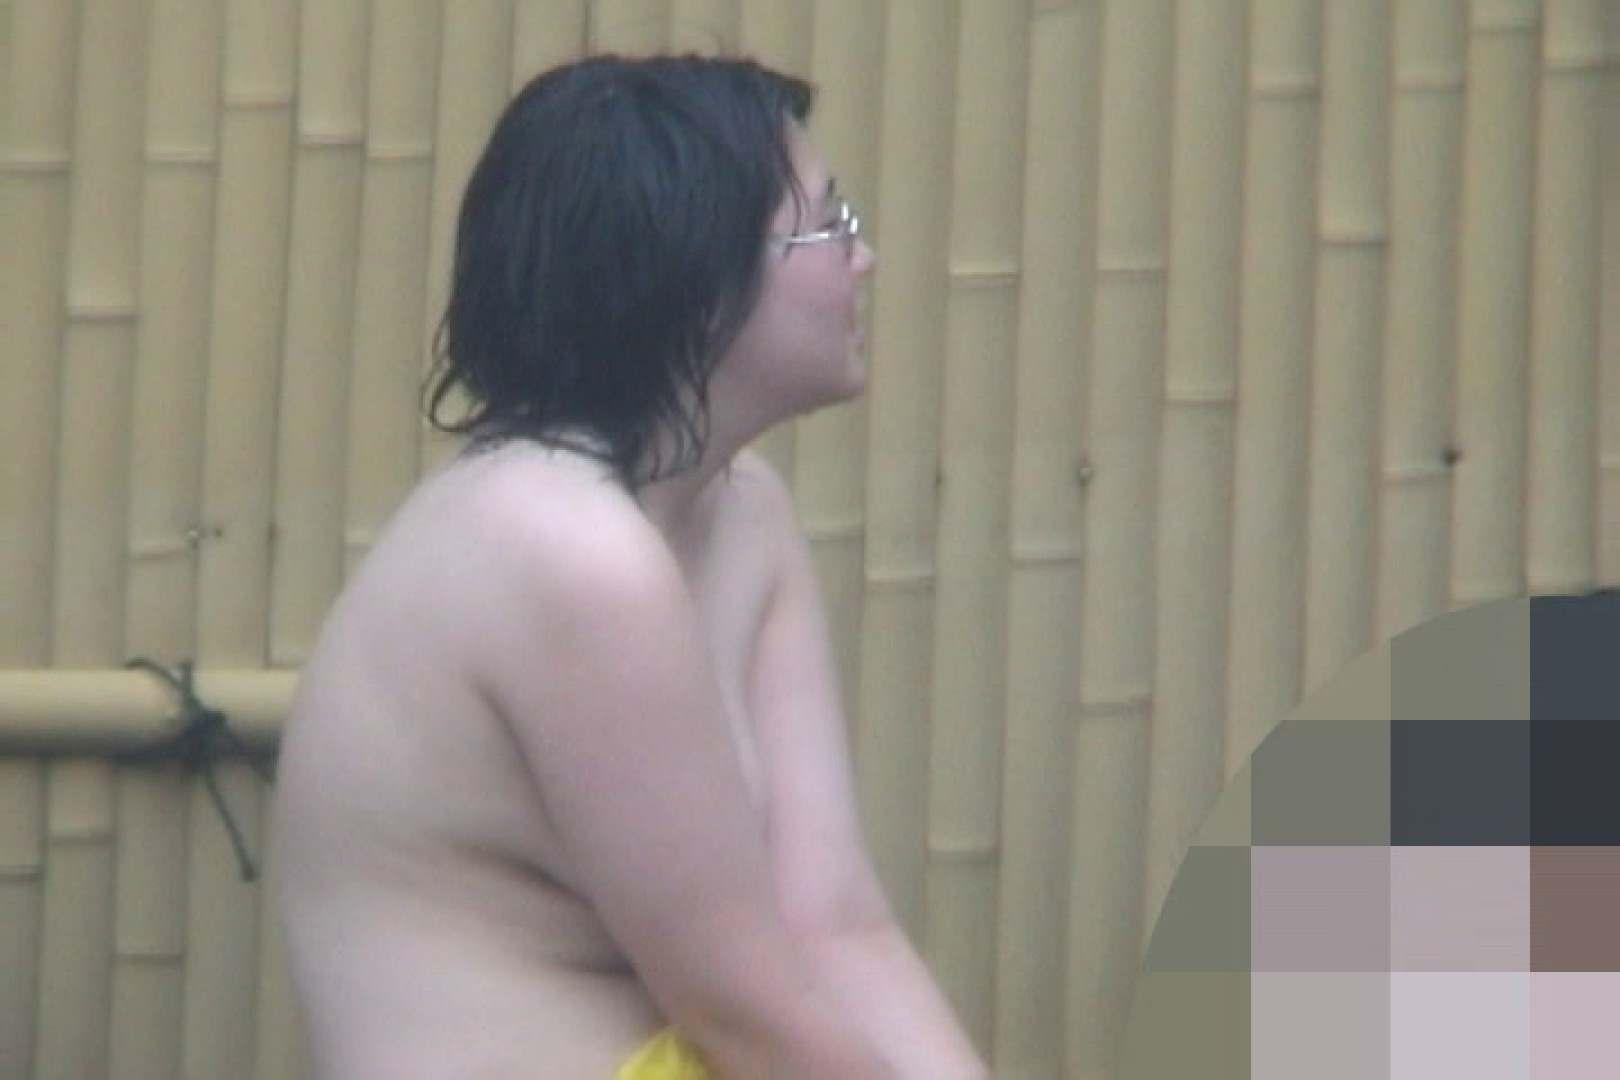 Aquaな露天風呂Vol.46【VIP限定】 0   0  54連発 15